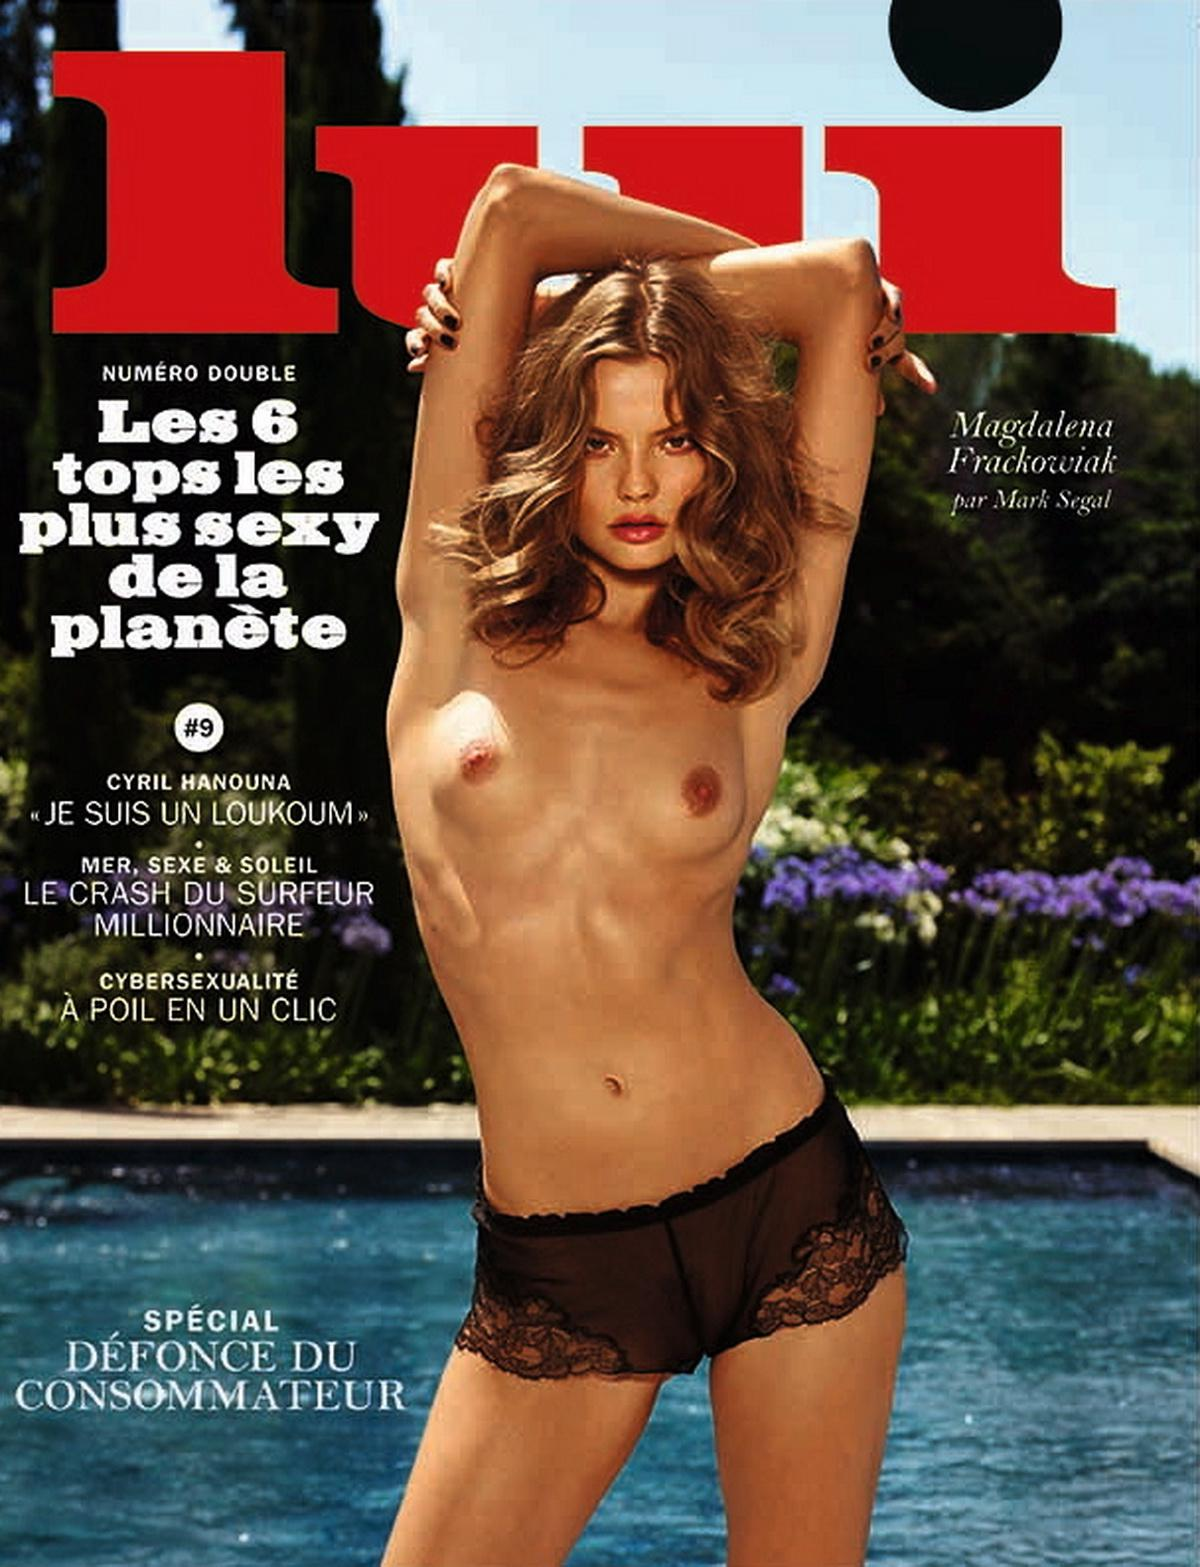 Magdalena Frackowiak Nude, Topless And Sexy